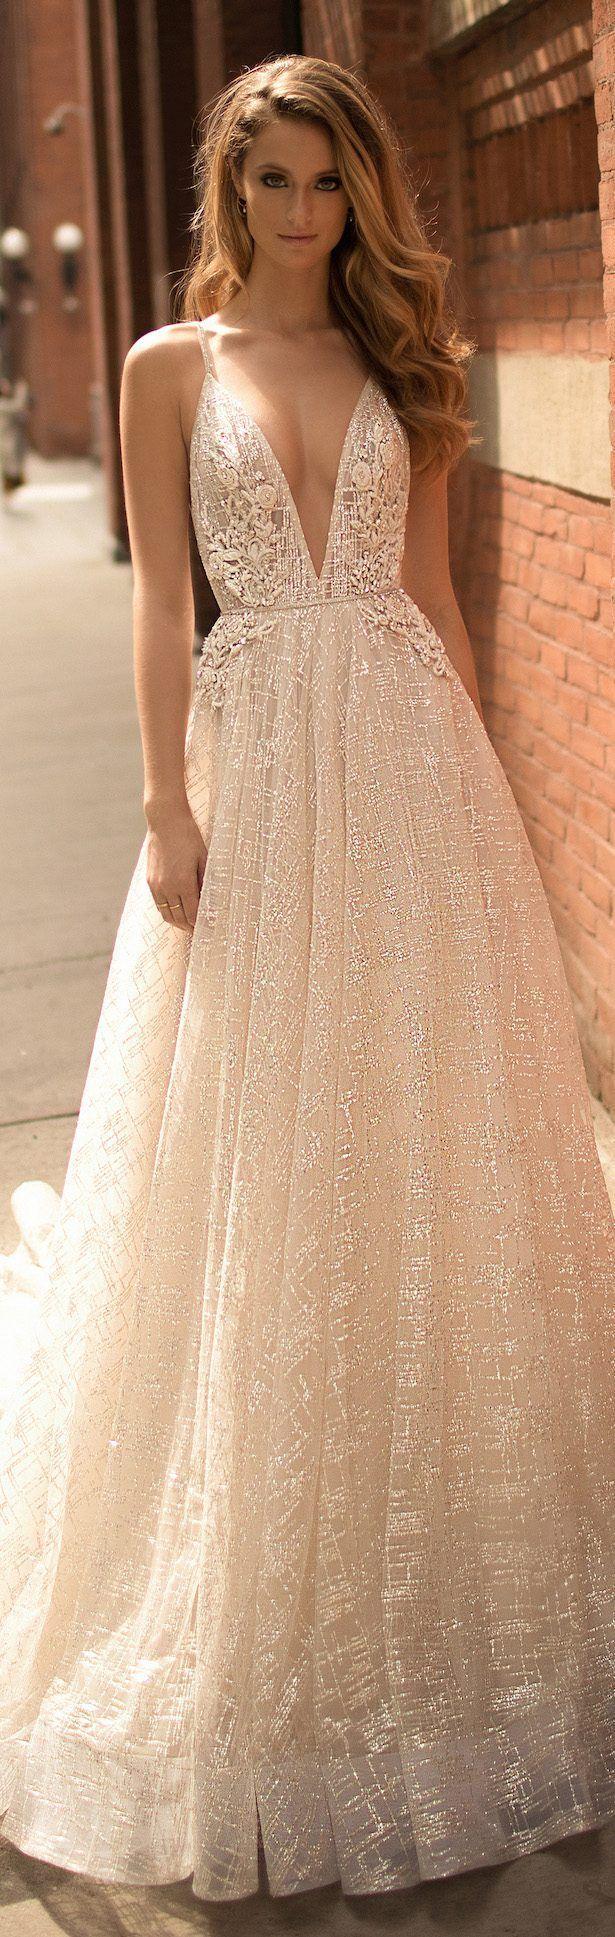 Berta Wedding Dress Collection Spring 2018 | Oscar Kleider ...